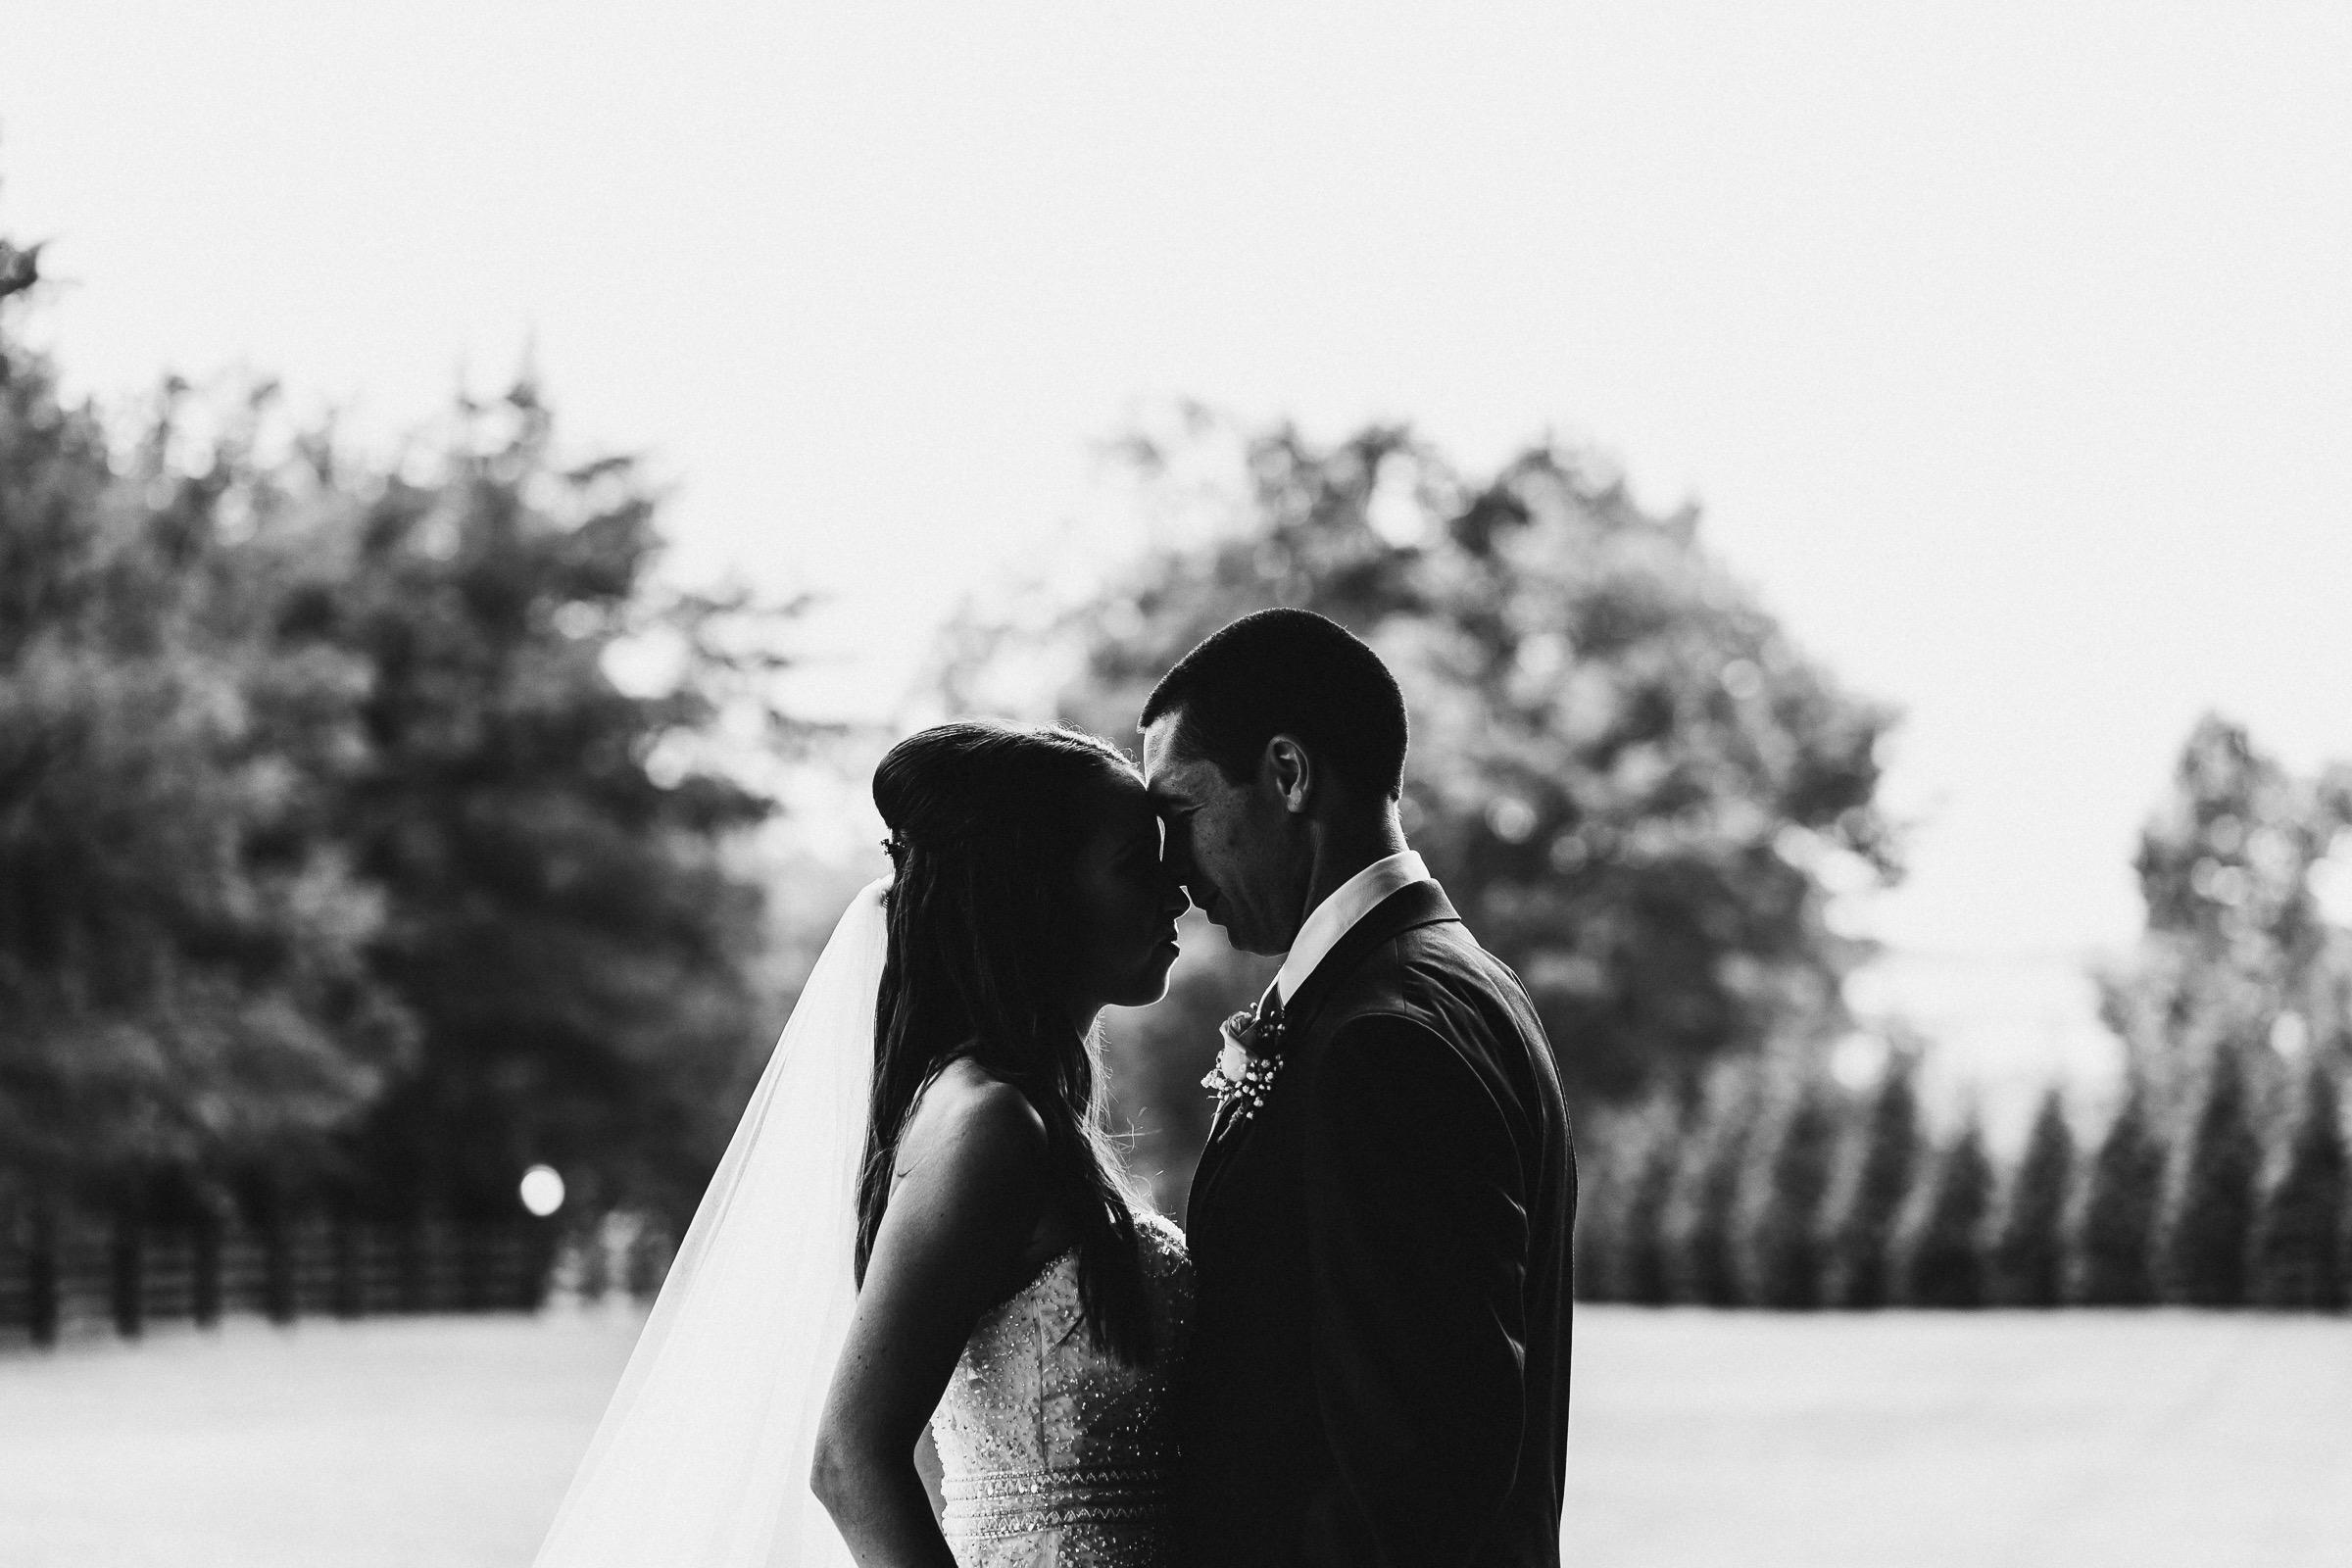 jim and jasmine wedding in danville va by jonathan hannah photography-18.jpg